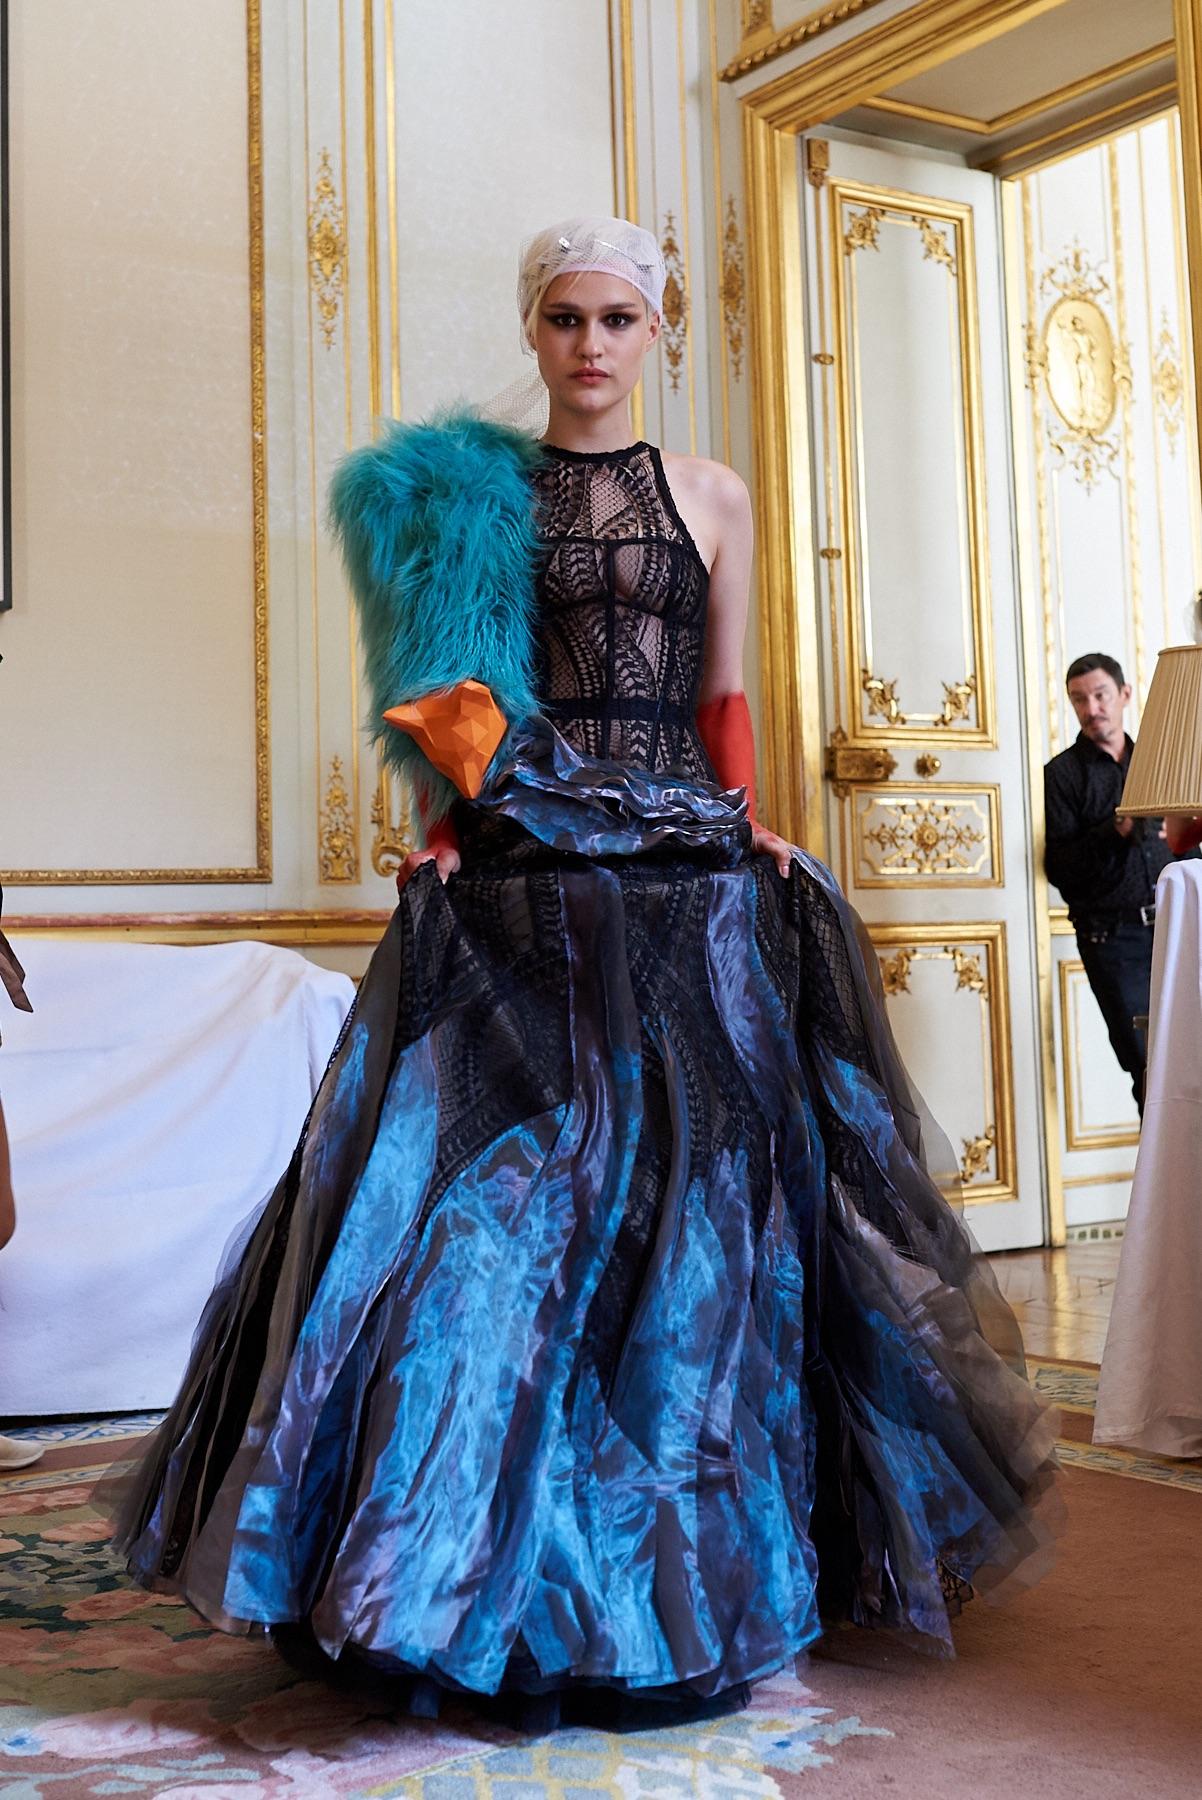 Antonio Ortega Couture - Backstage - Foto @vincewll